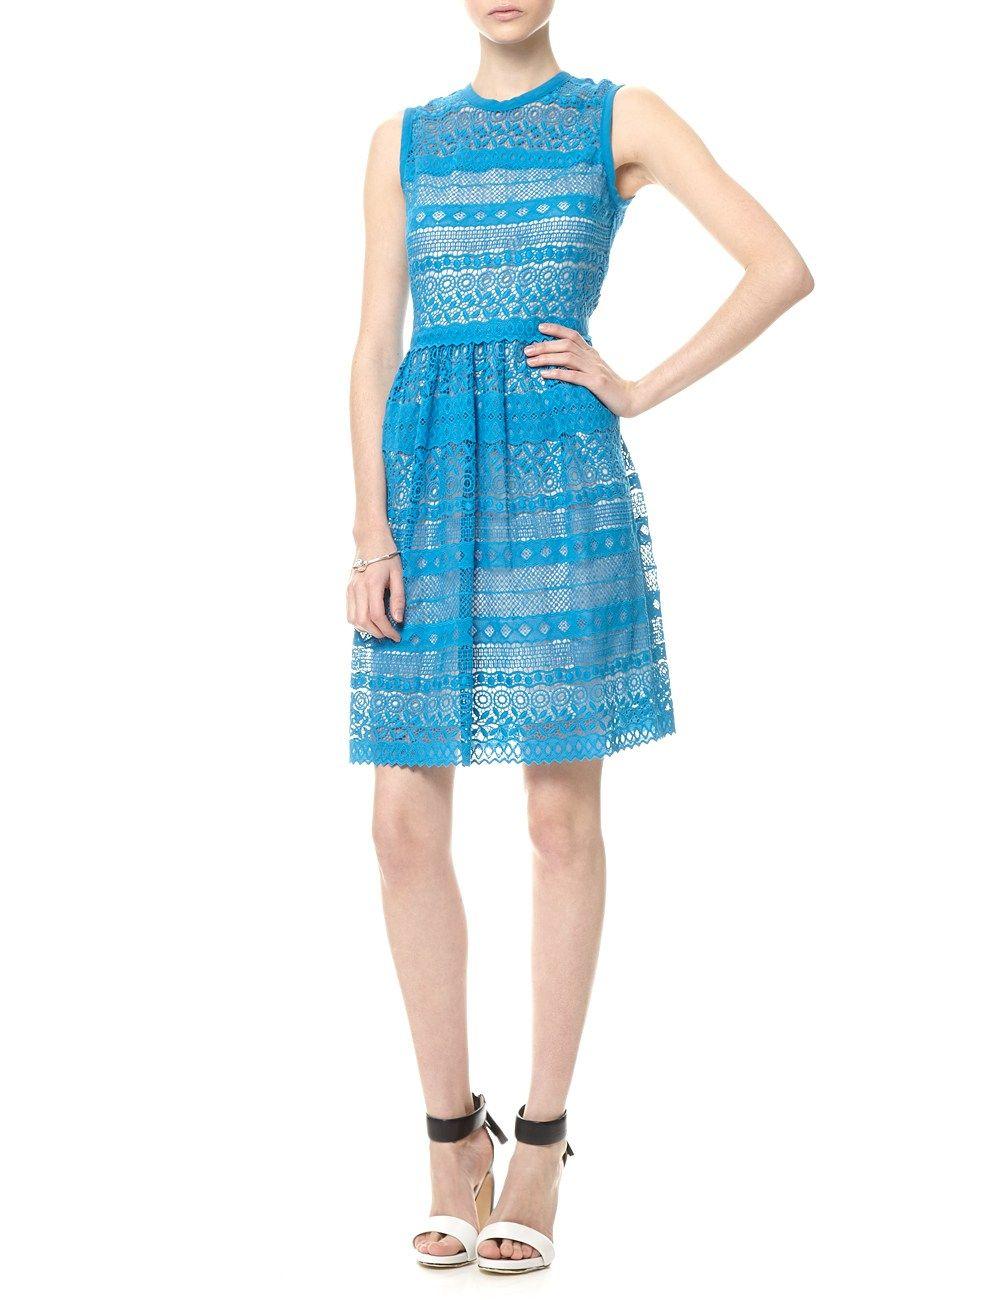 Aqua Lace Venice Dress | Yigal Azrouël | Avenue32